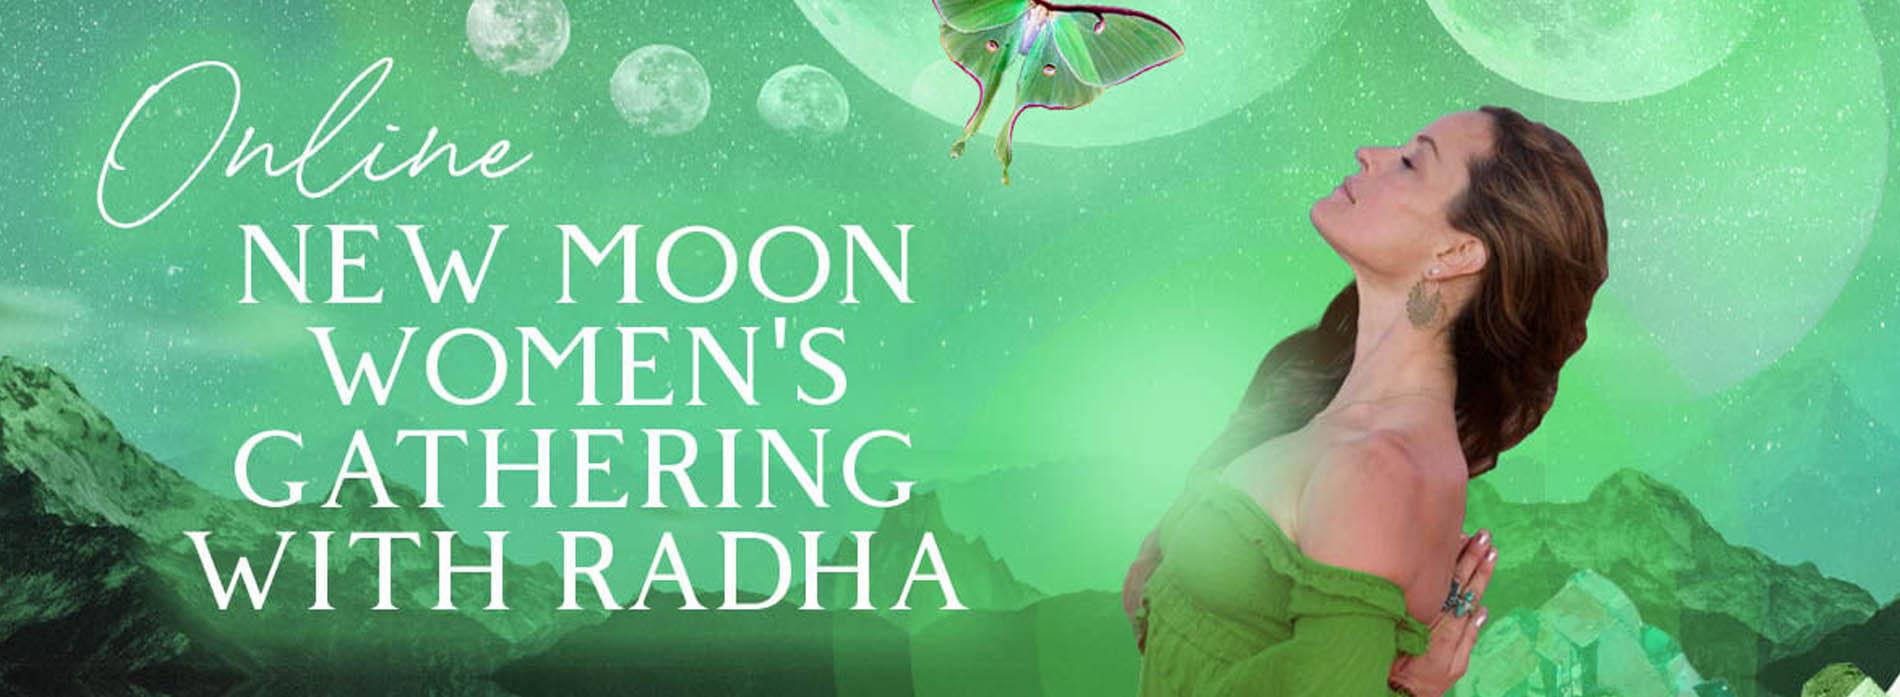 Radha Womens Circle